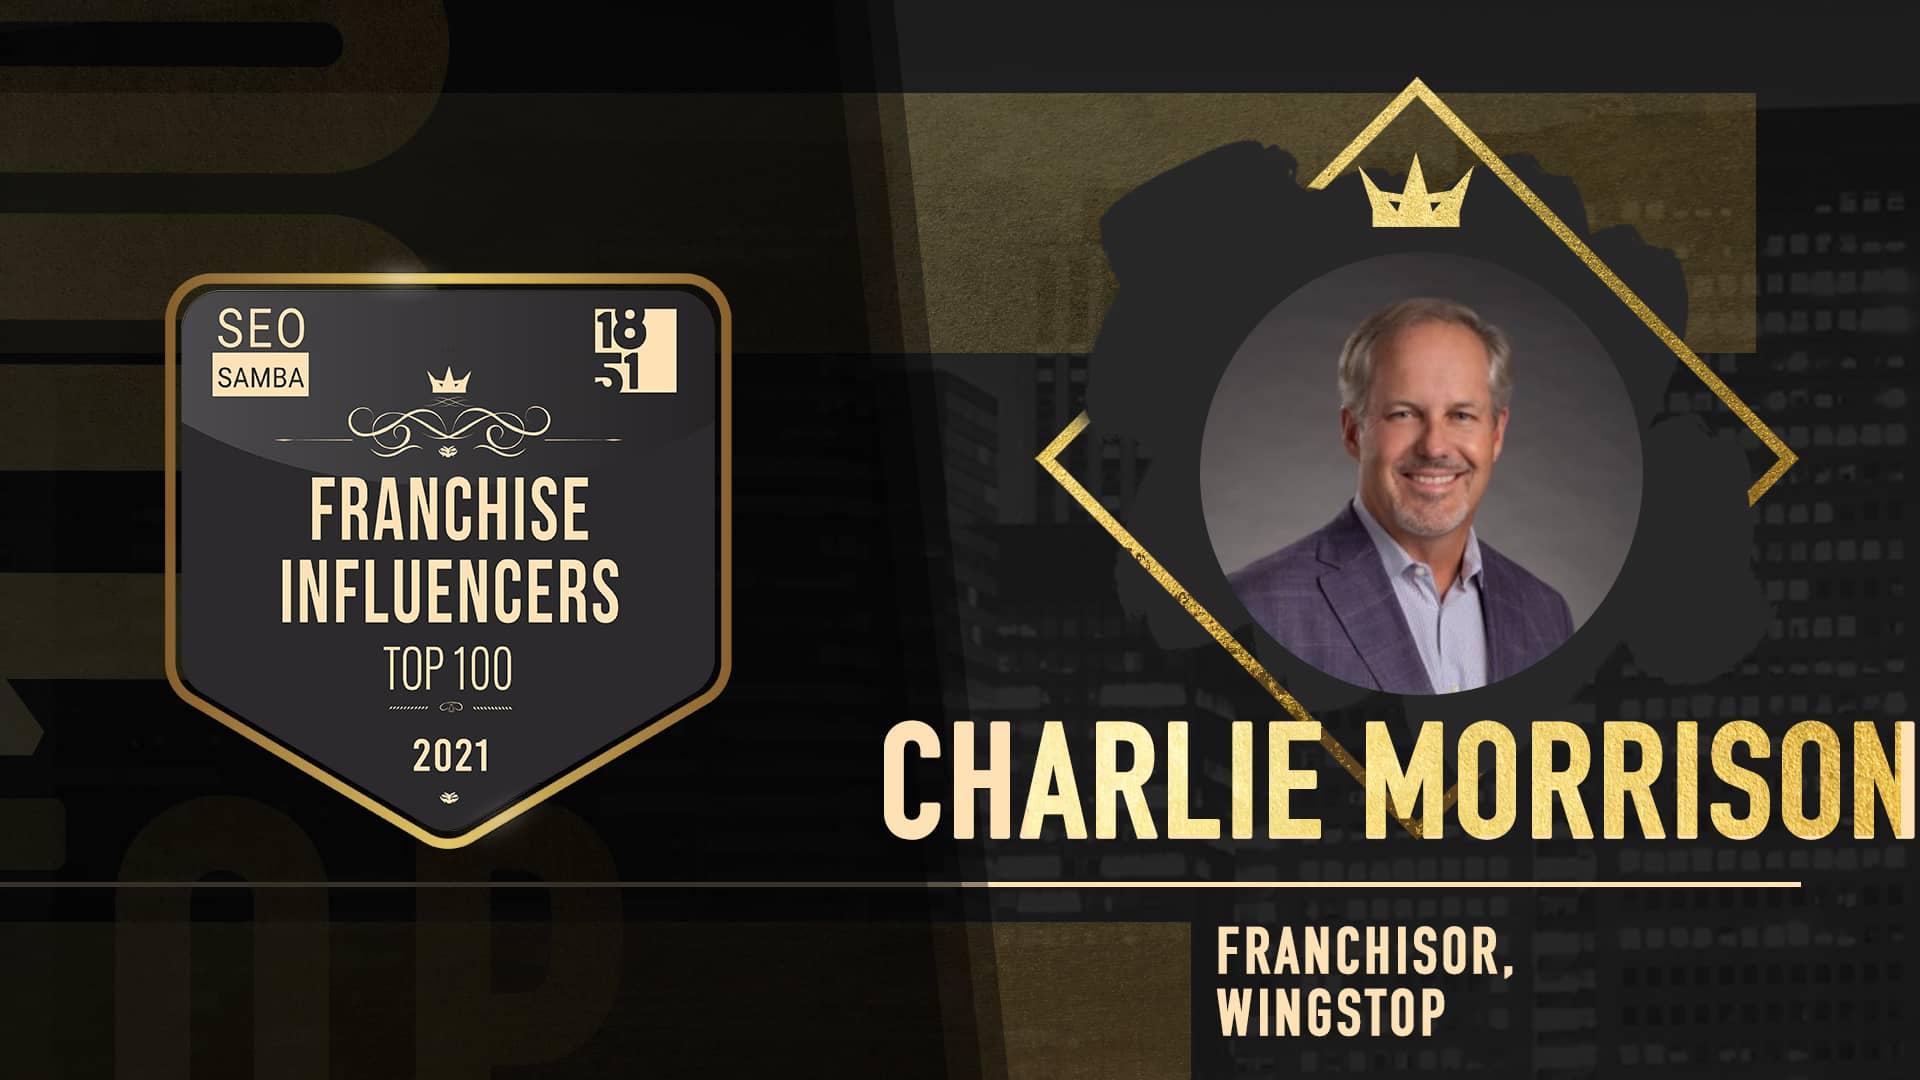 Charlie Morrison - Wingstop